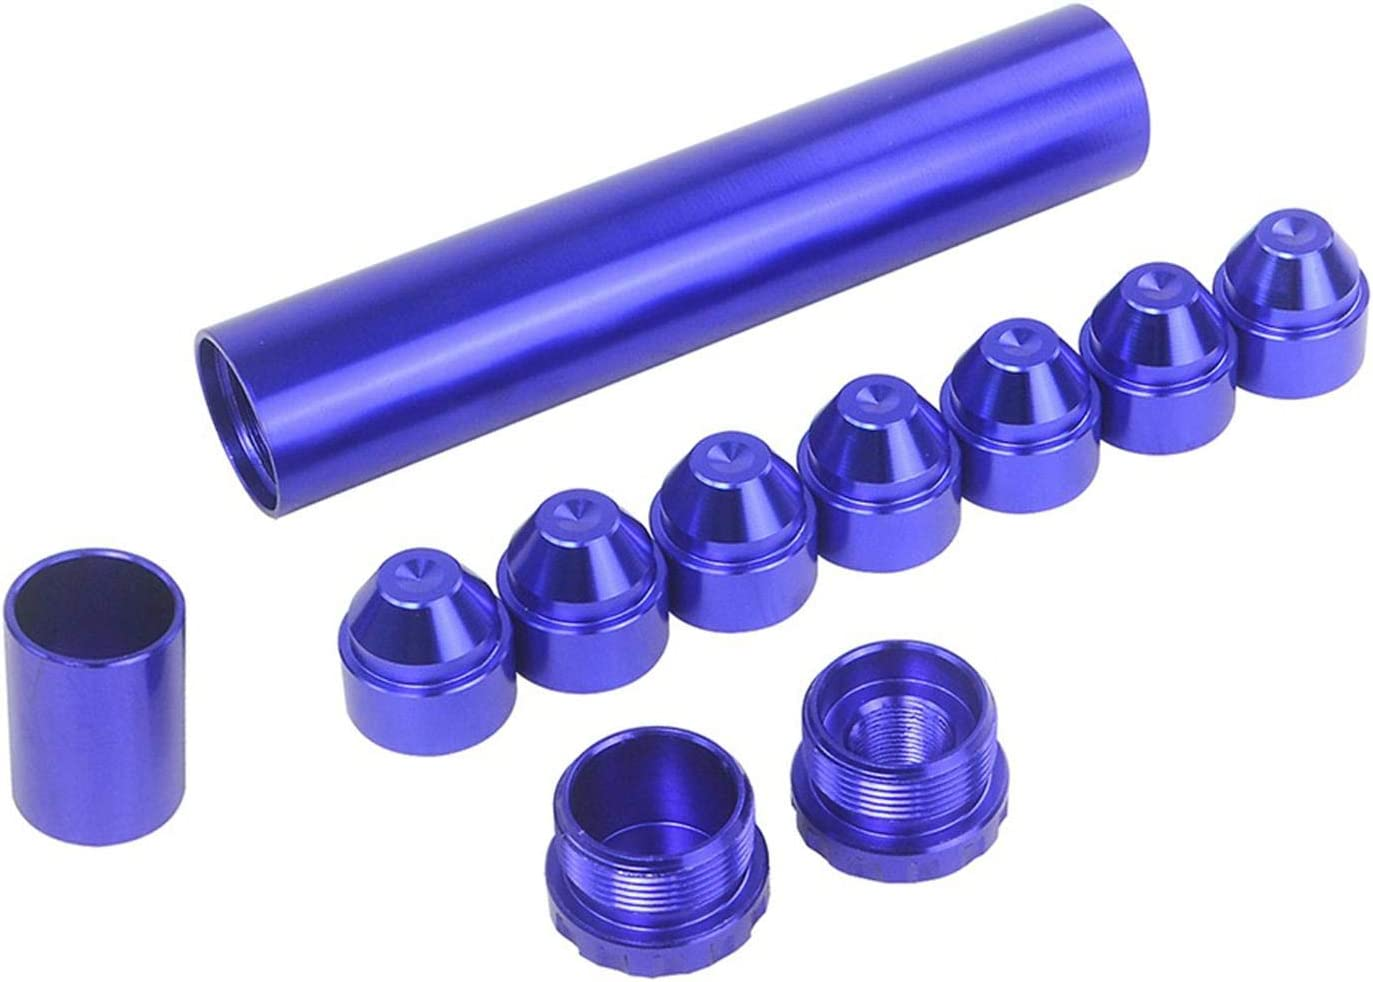 Tongyundacheng 1//2-28 5//8-24 Kraftstofffilter F/ür Kraftfahrzeuge Gartensprinklerfilter Kompatibel Mit Napa 4003 Wix 24003 L/ösungsmittelfallenfilter Aus Aluminiumlegierung